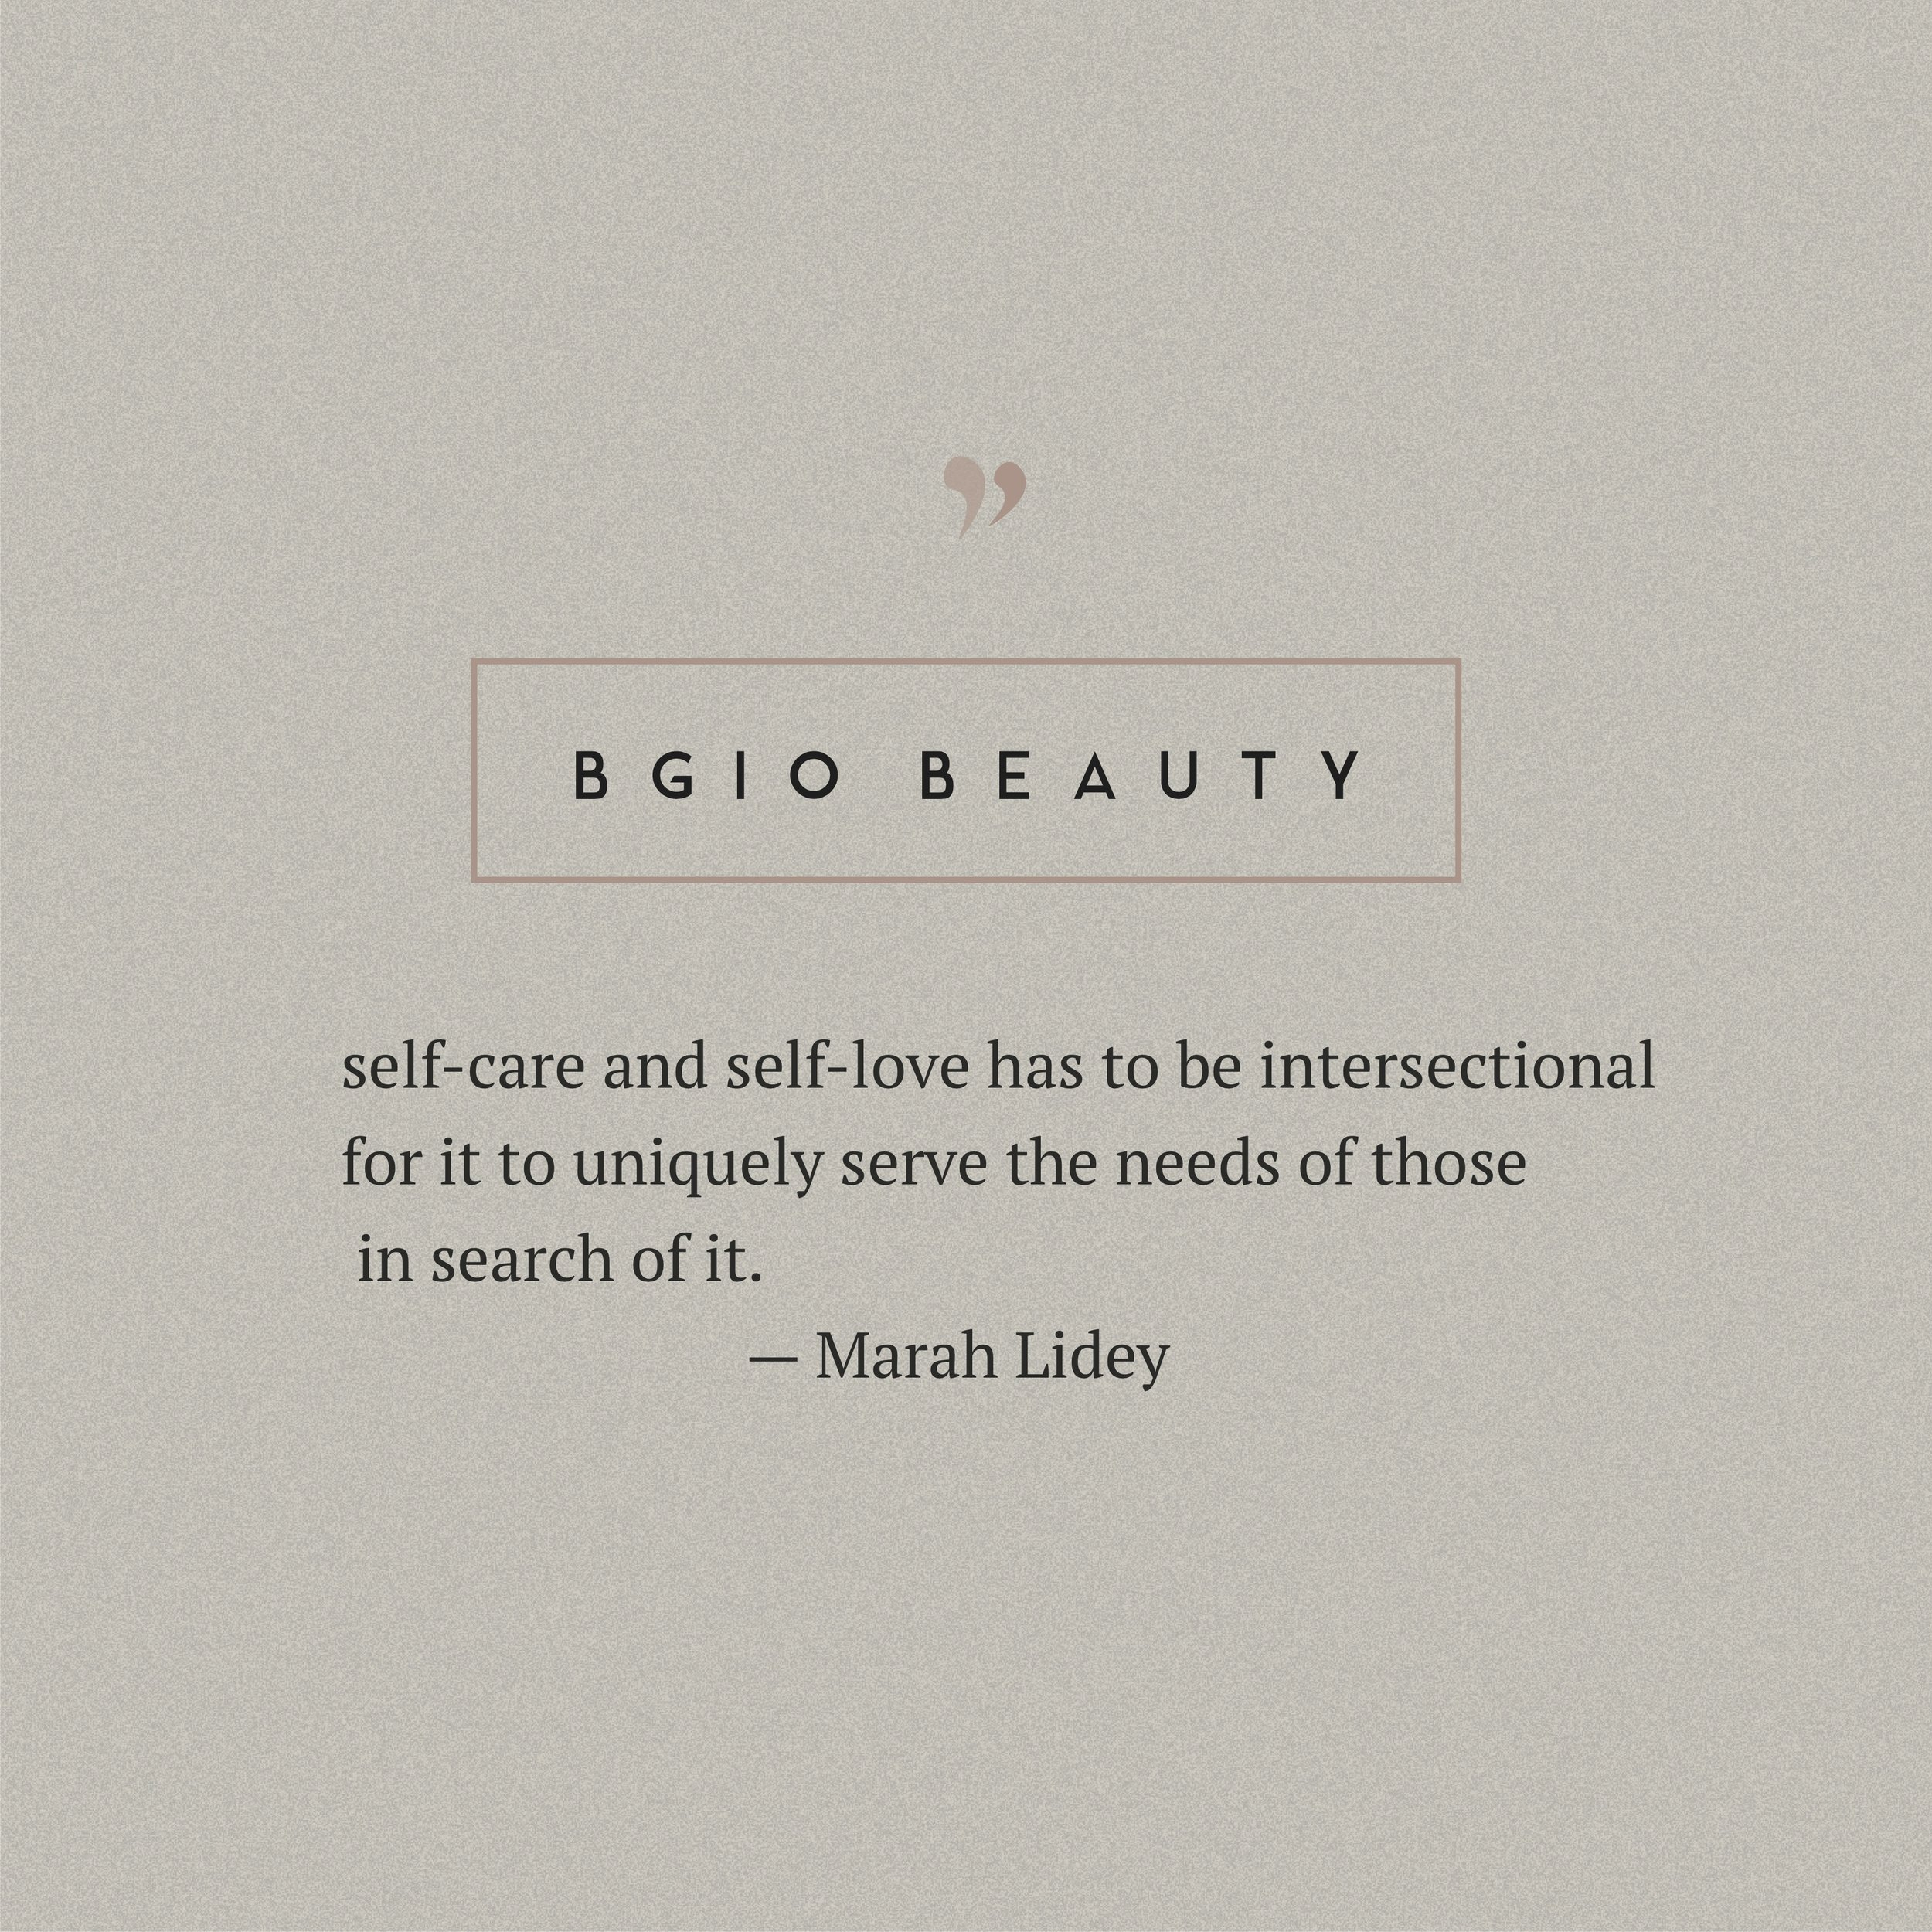 Click to tweet this inspiring quote! #BGIO